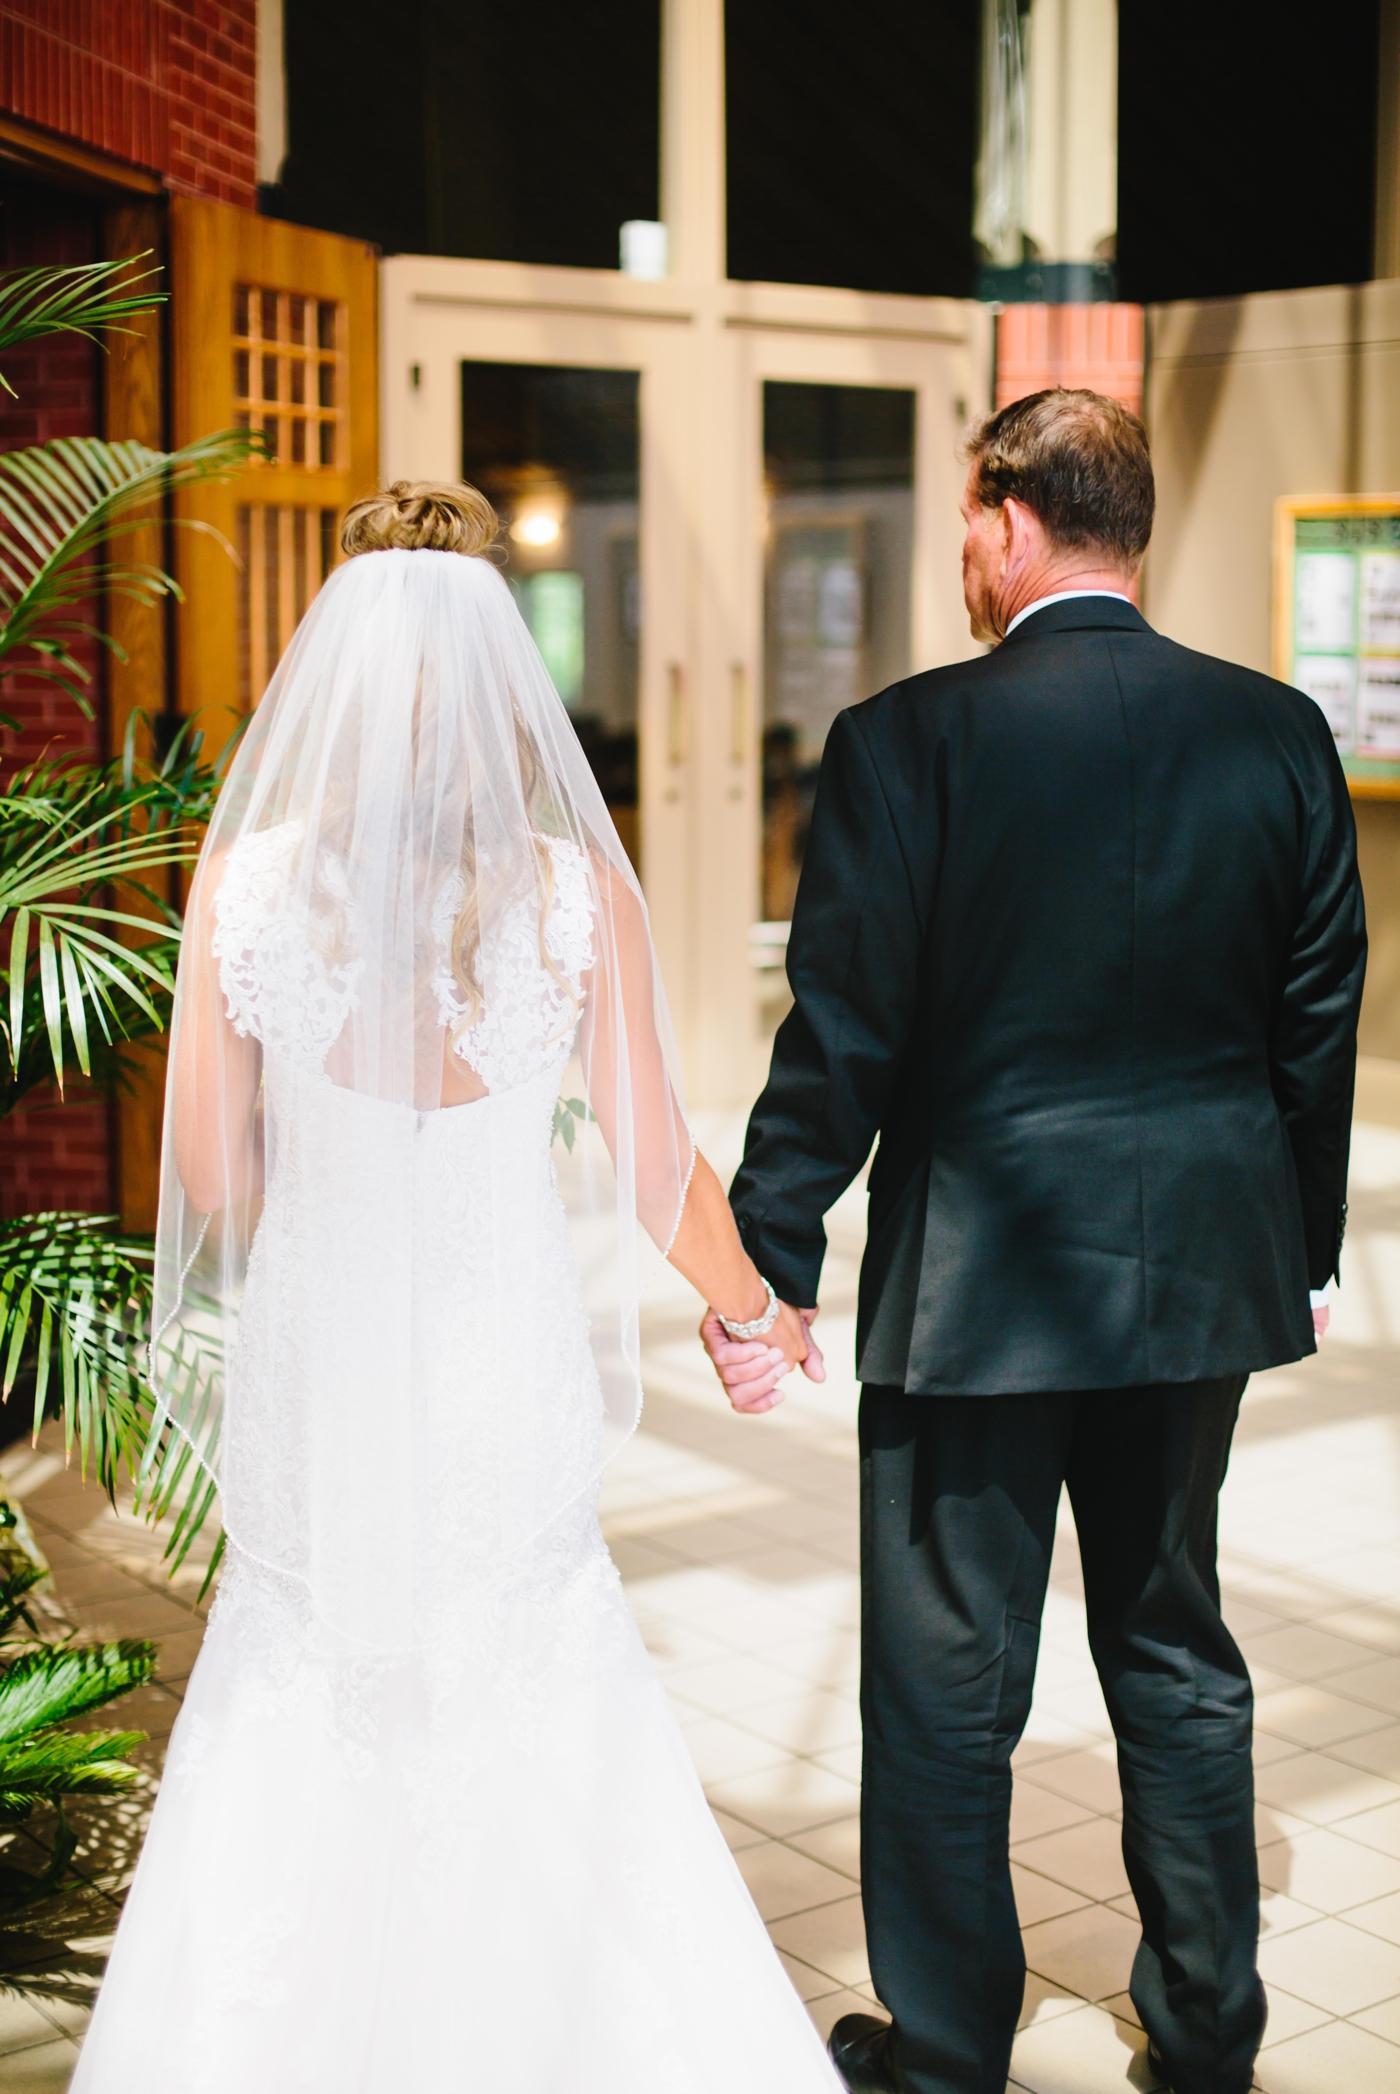 chicago-fine-art-wedding-photography-patano16